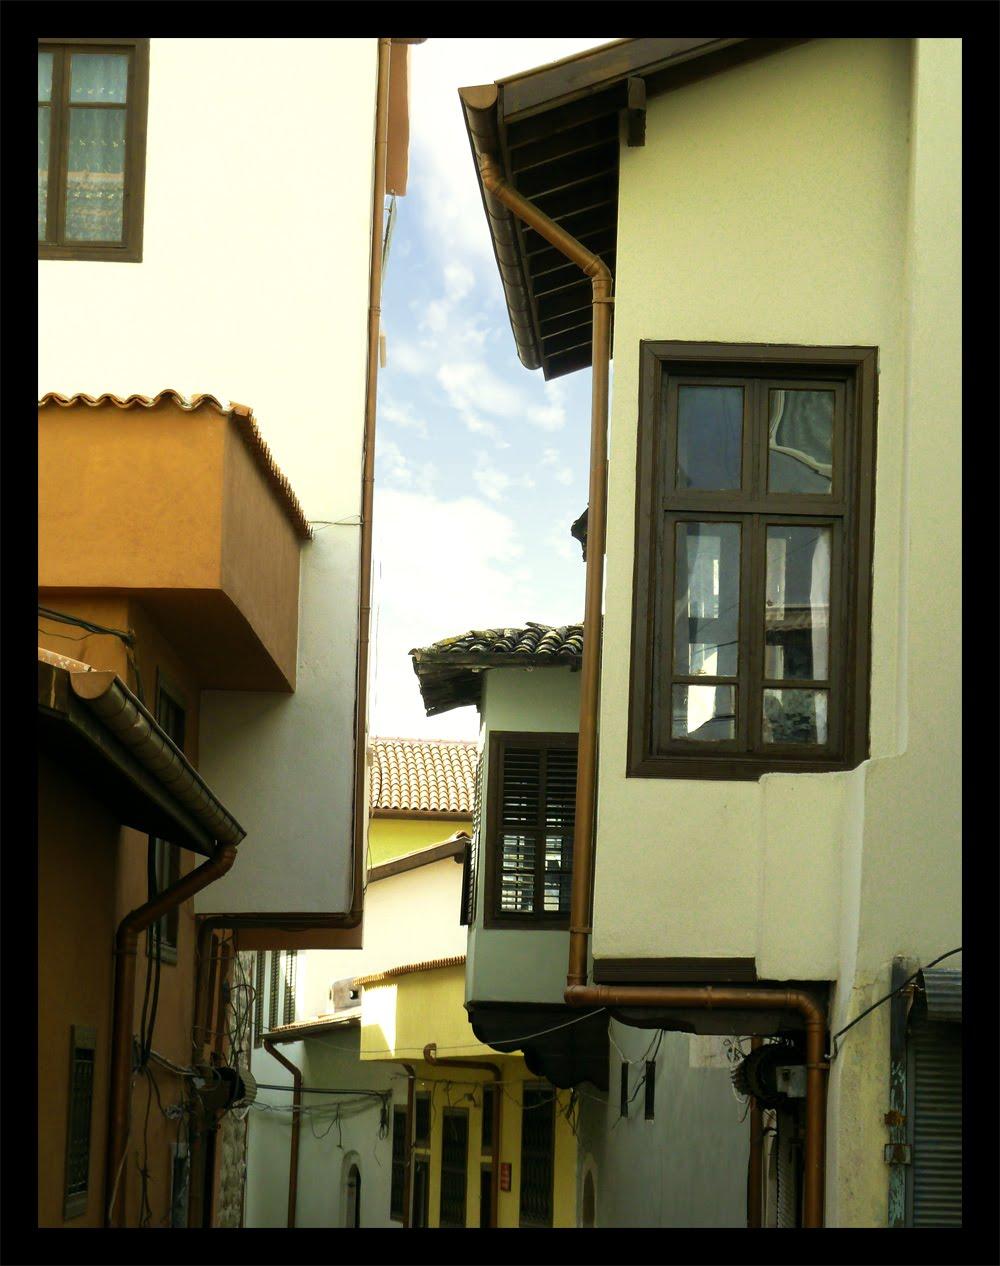 streets_of_antakya_cosiecosie